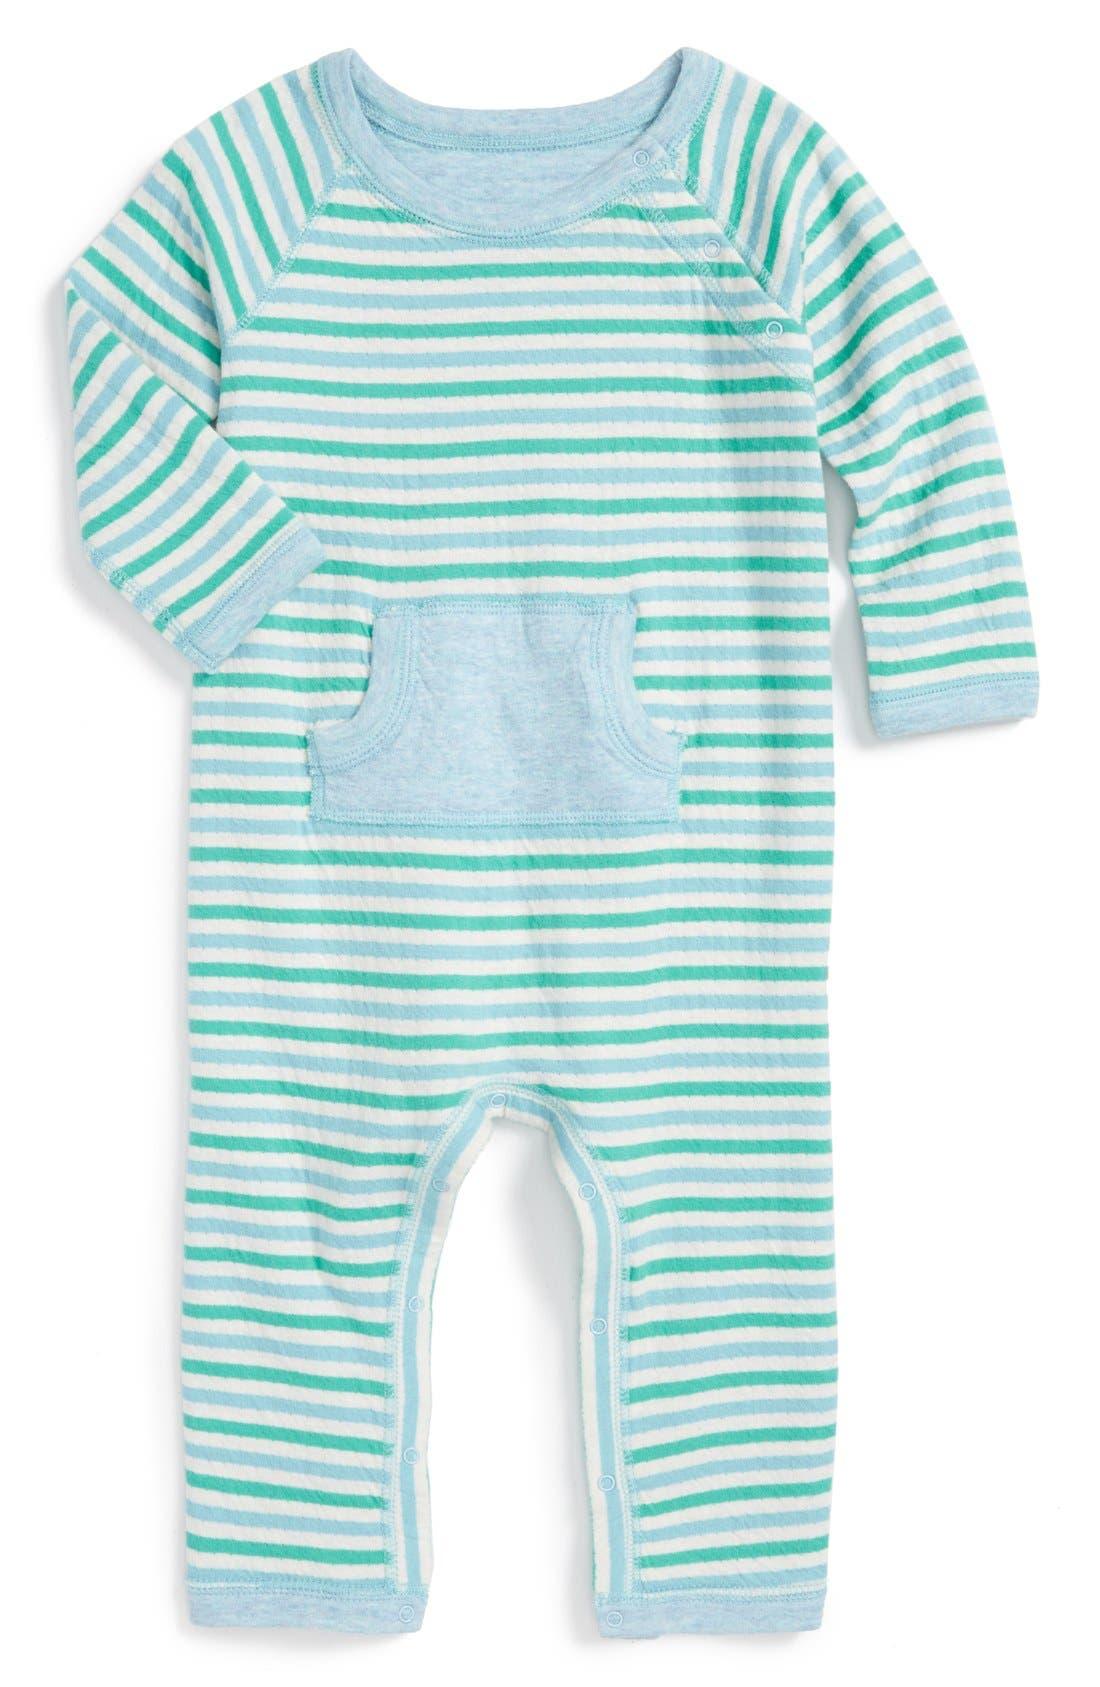 STEM BABY, Reversible Organic Cotton Romper, Main thumbnail 1, color, 450